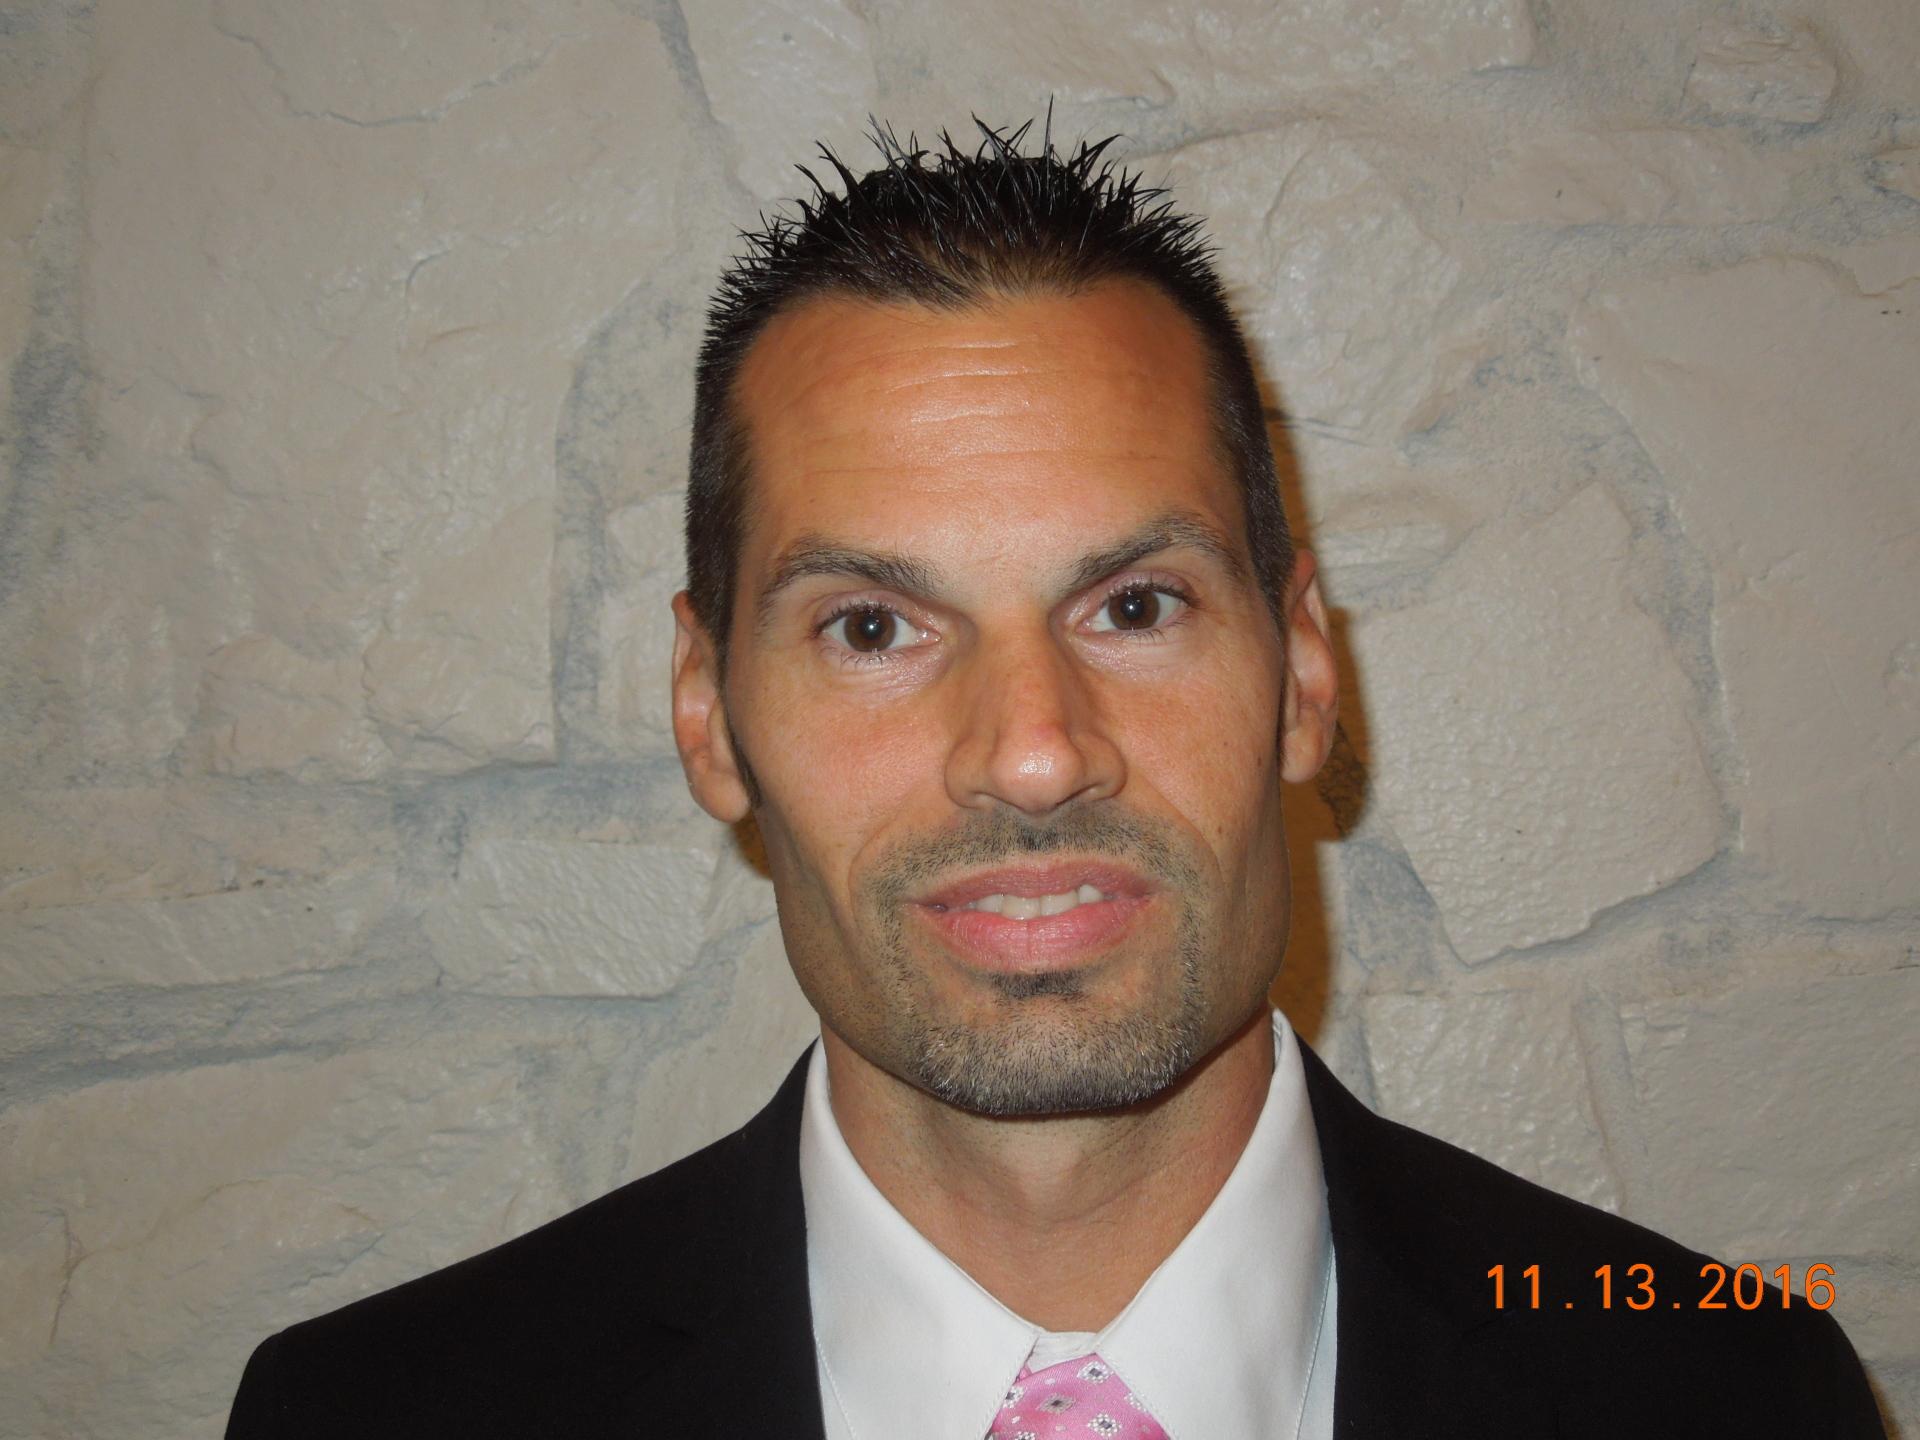 Juanito Dominguez